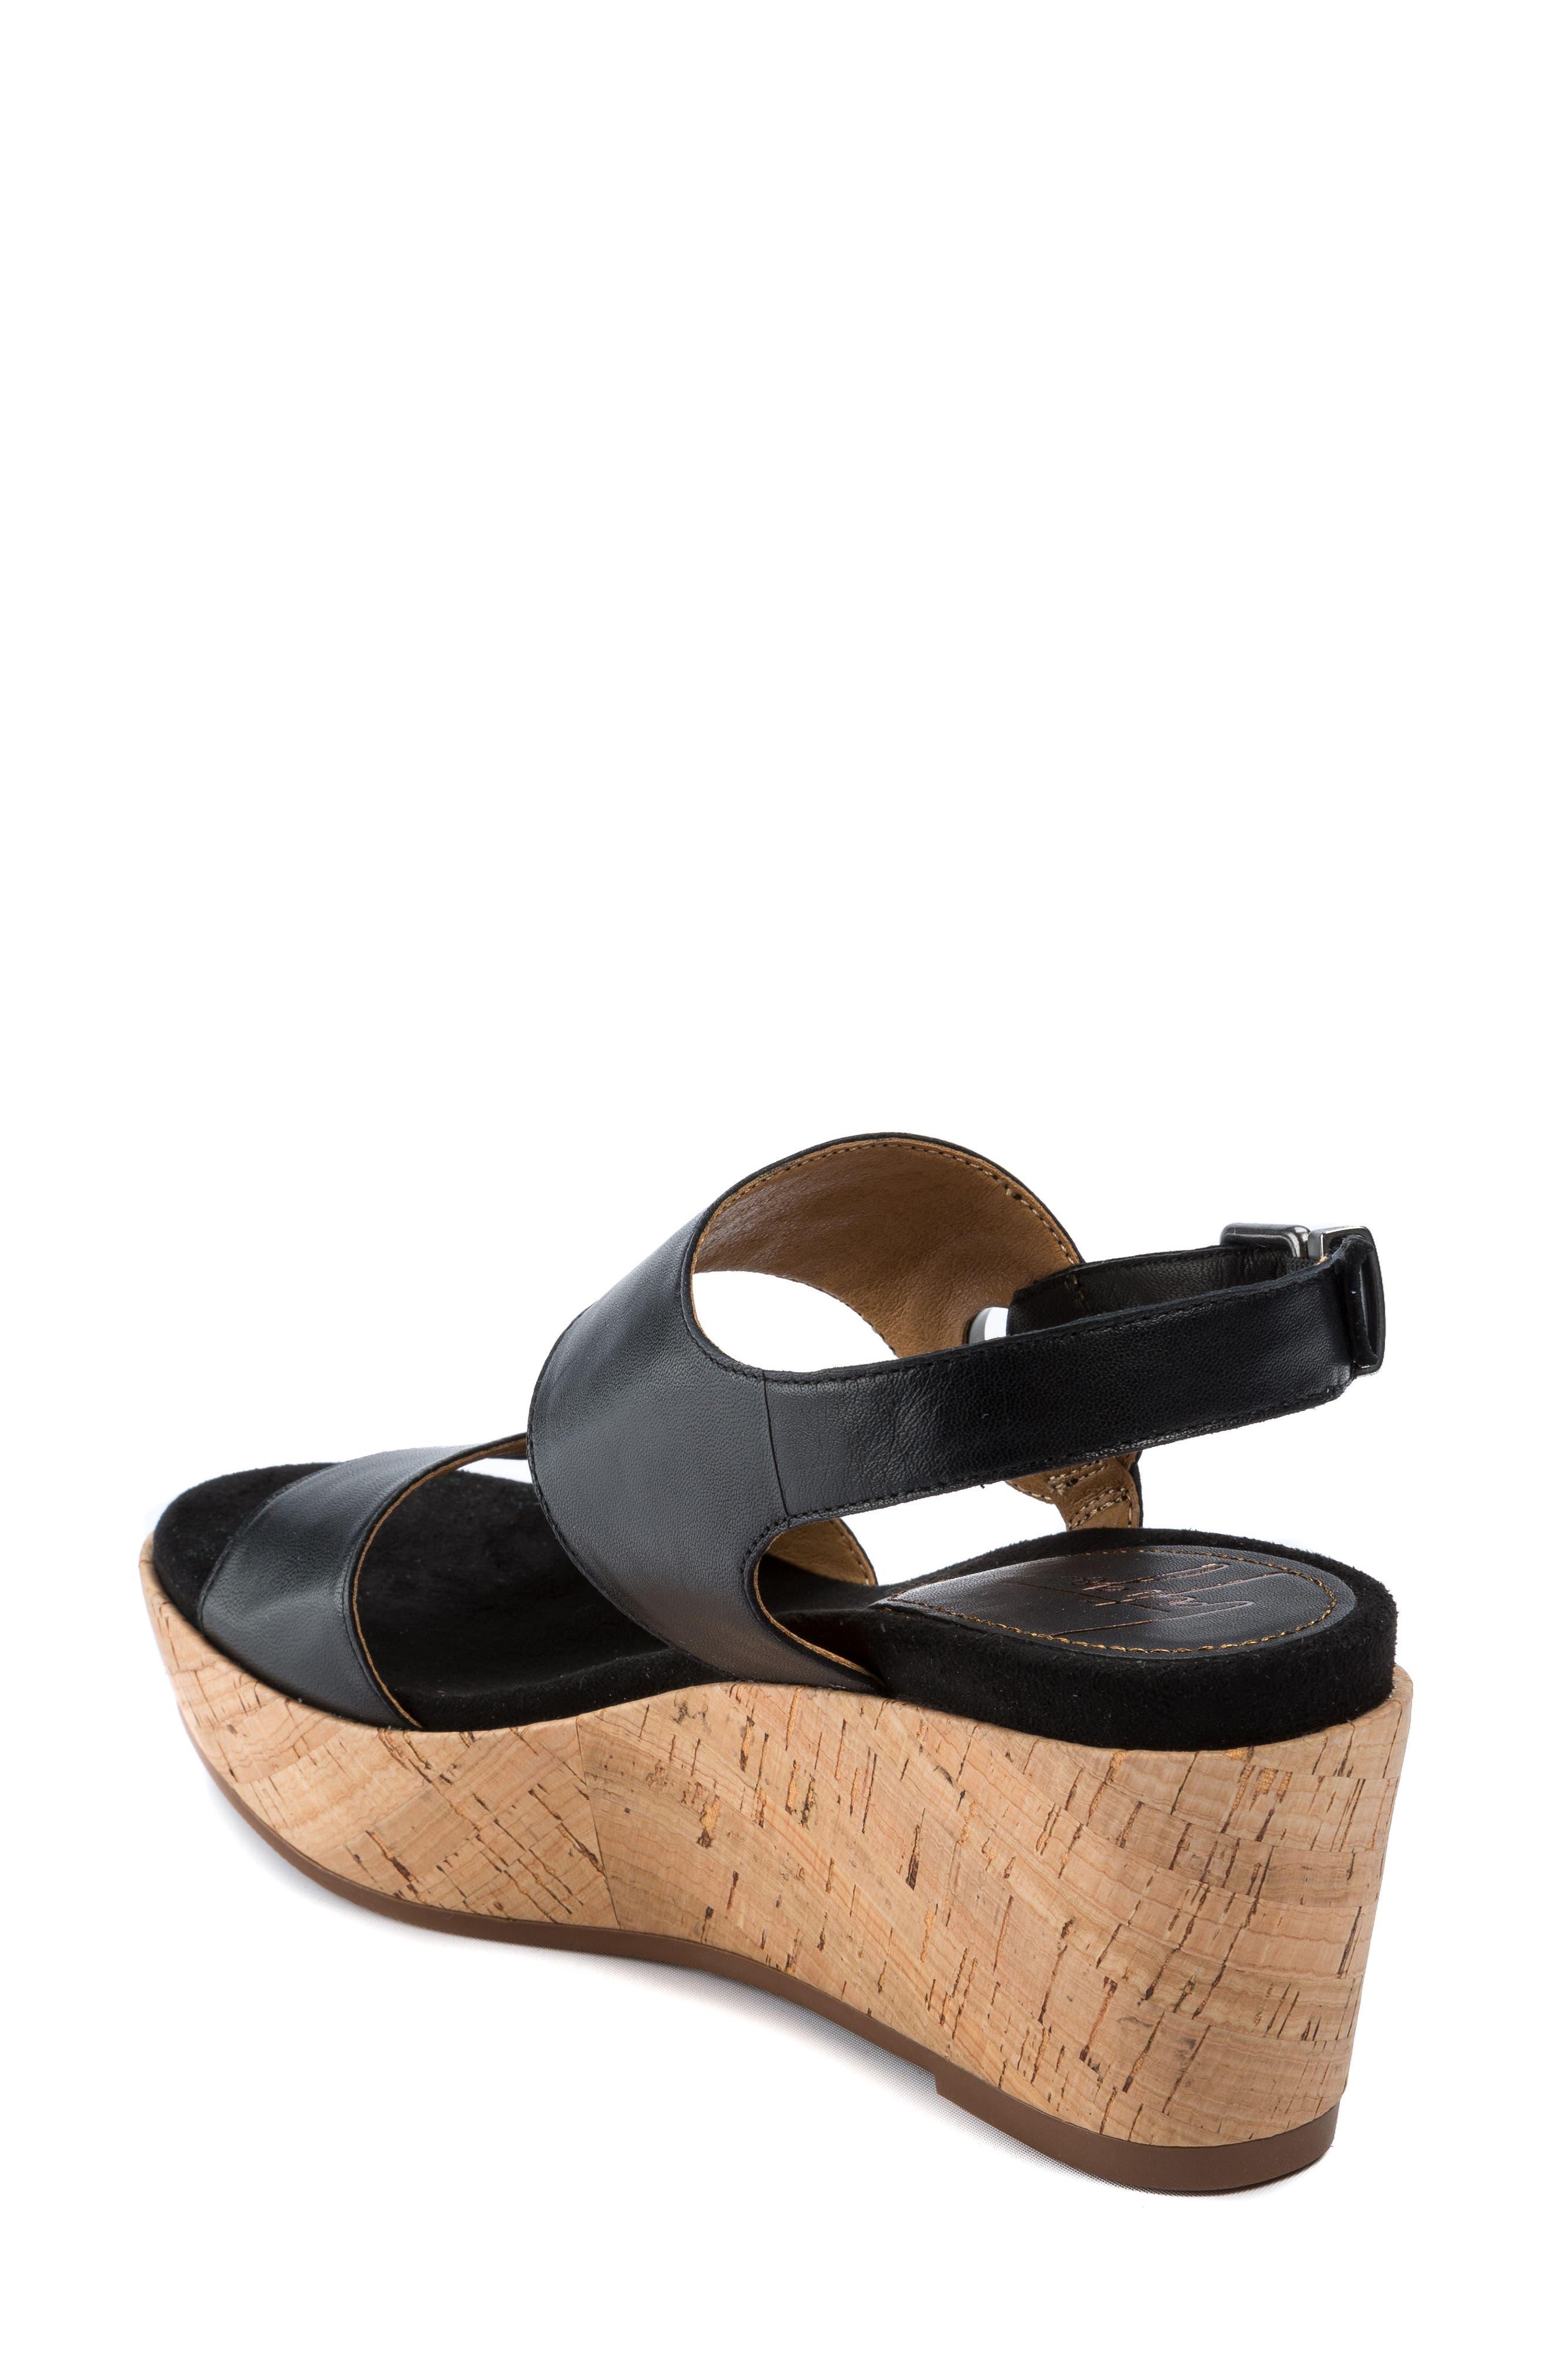 Lauren Platform Wedge Sandal,                             Alternate thumbnail 2, color,                             001